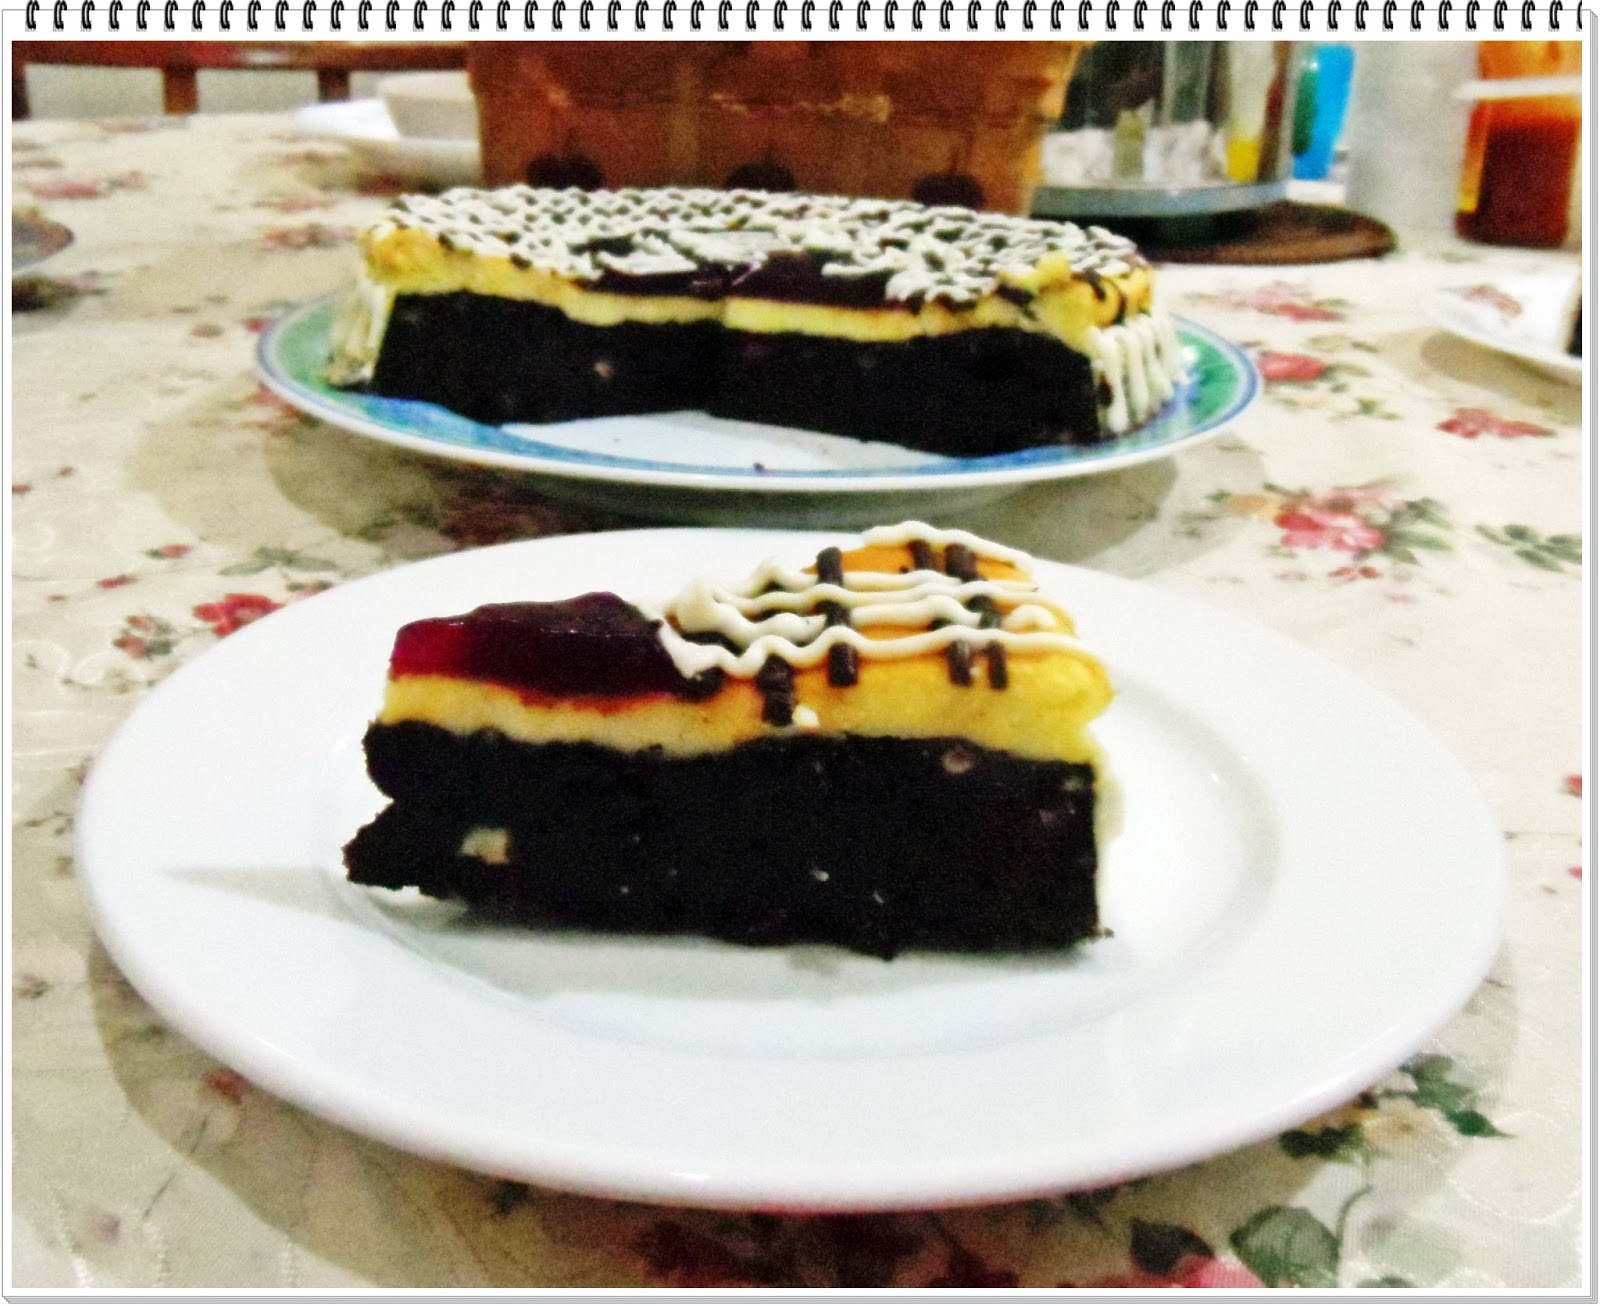 SinaranMenu: Cappuccino Brownie Cheesecake